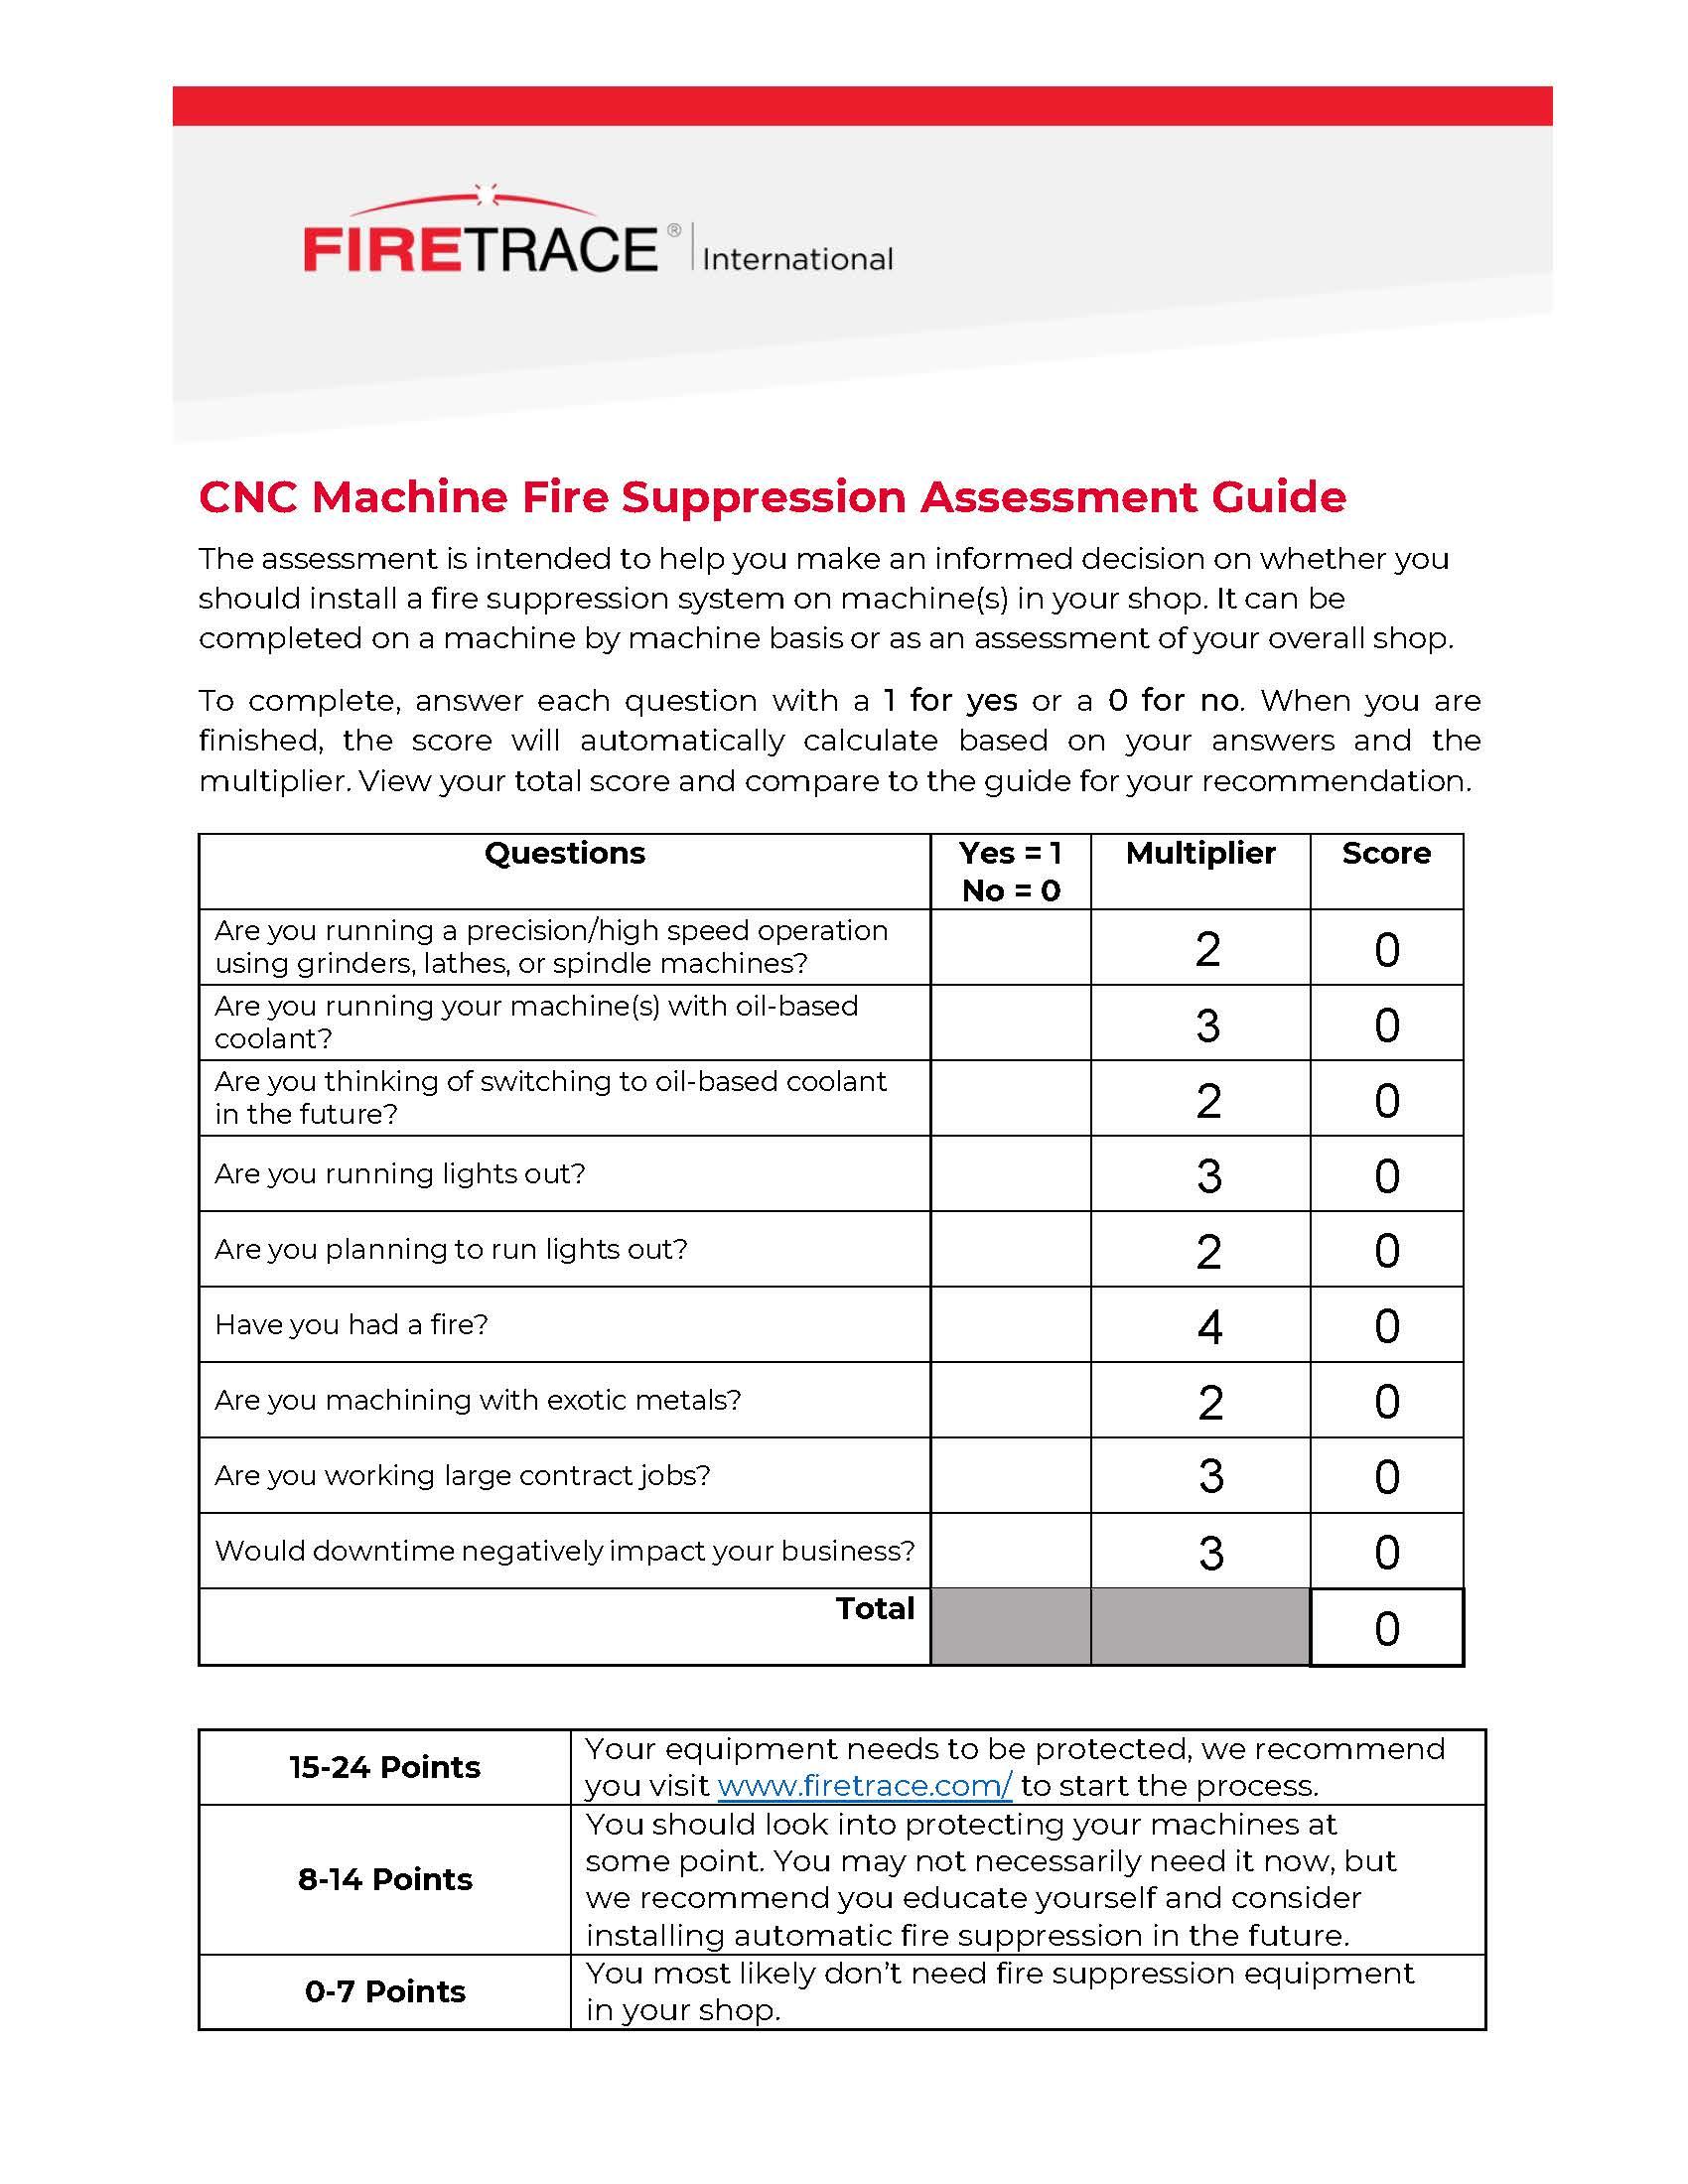 Firetrace_CNC_Fire_Suppression_Assessment_Guide